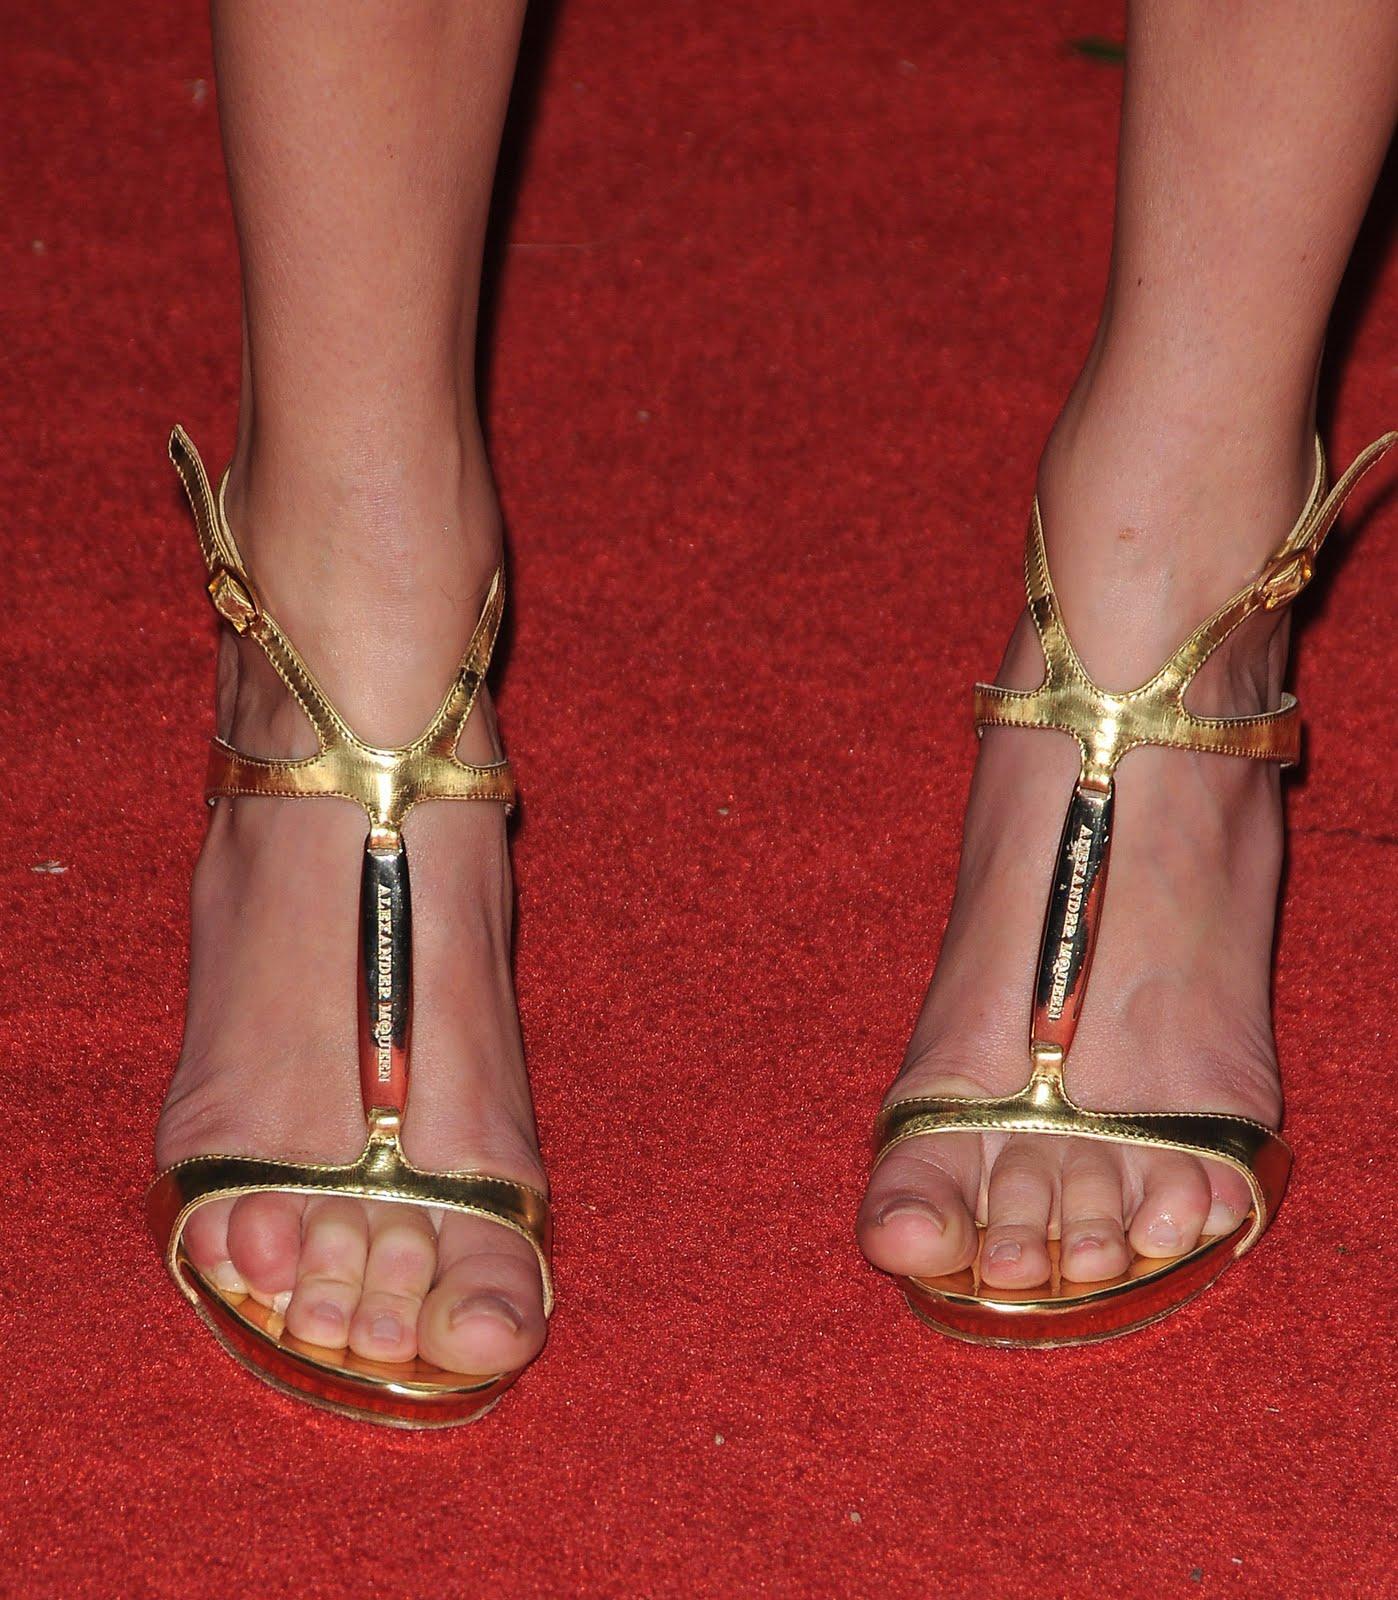 http://3.bp.blogspot.com/_UaLWp72nij4/S-R_HeqvTWI/AAAAAAAAKM4/nAMs8nqlsk4/s1600/kate-bosworth-feet.jpg